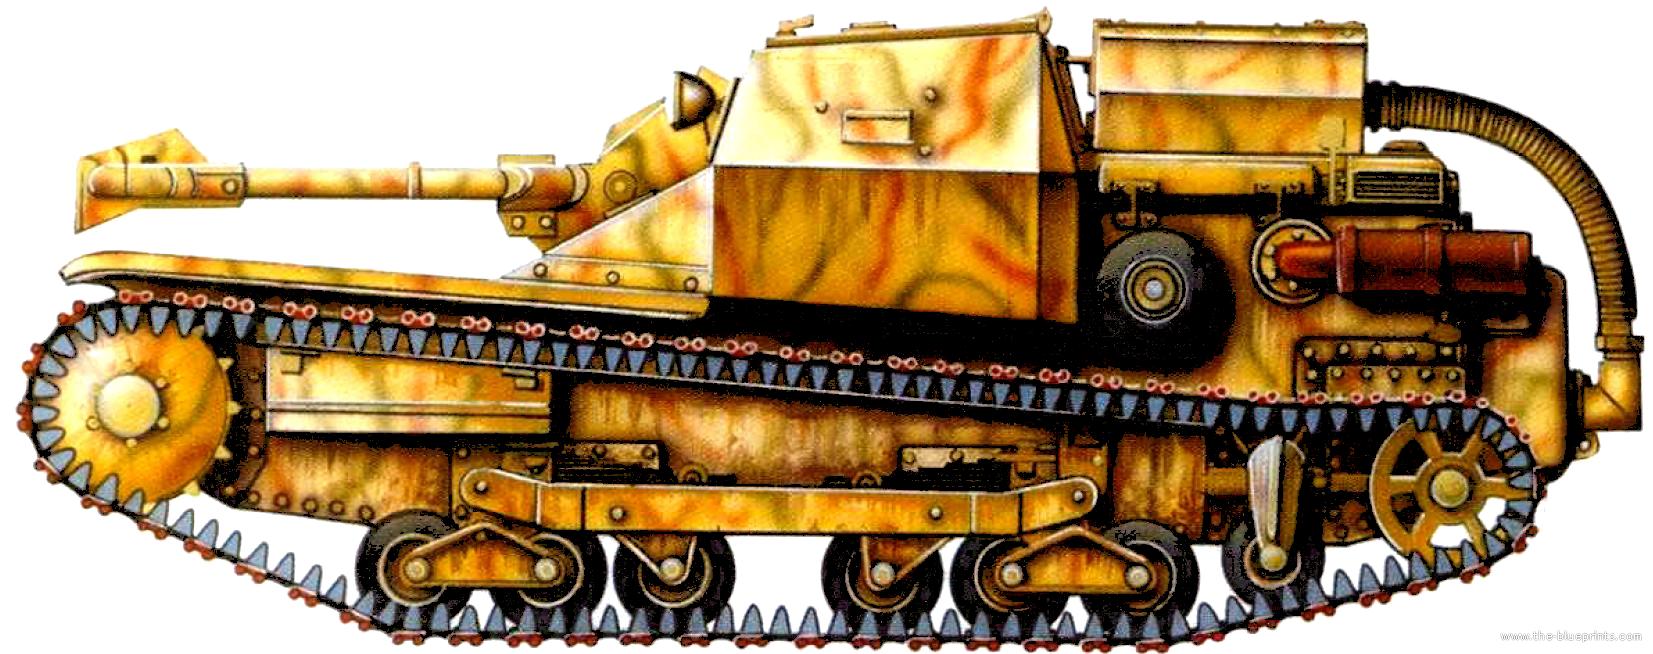 blueprints  u0026gt  tanks  u0026gt  tanks c  u0026gt  carro veloce cv